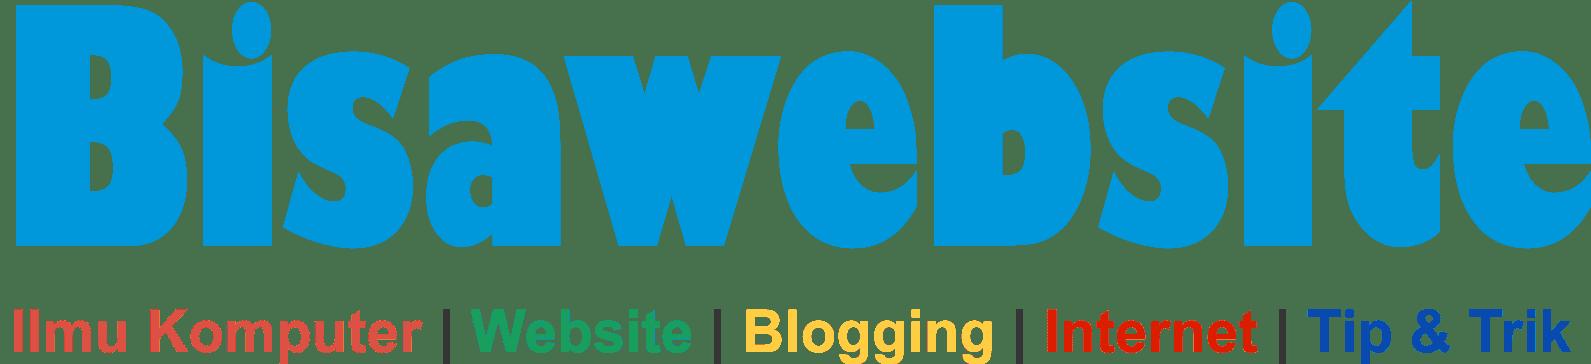 Bisawebsite || Tutorial Web,lmu Komputer, CMS, Framework, Android dan Teknologi